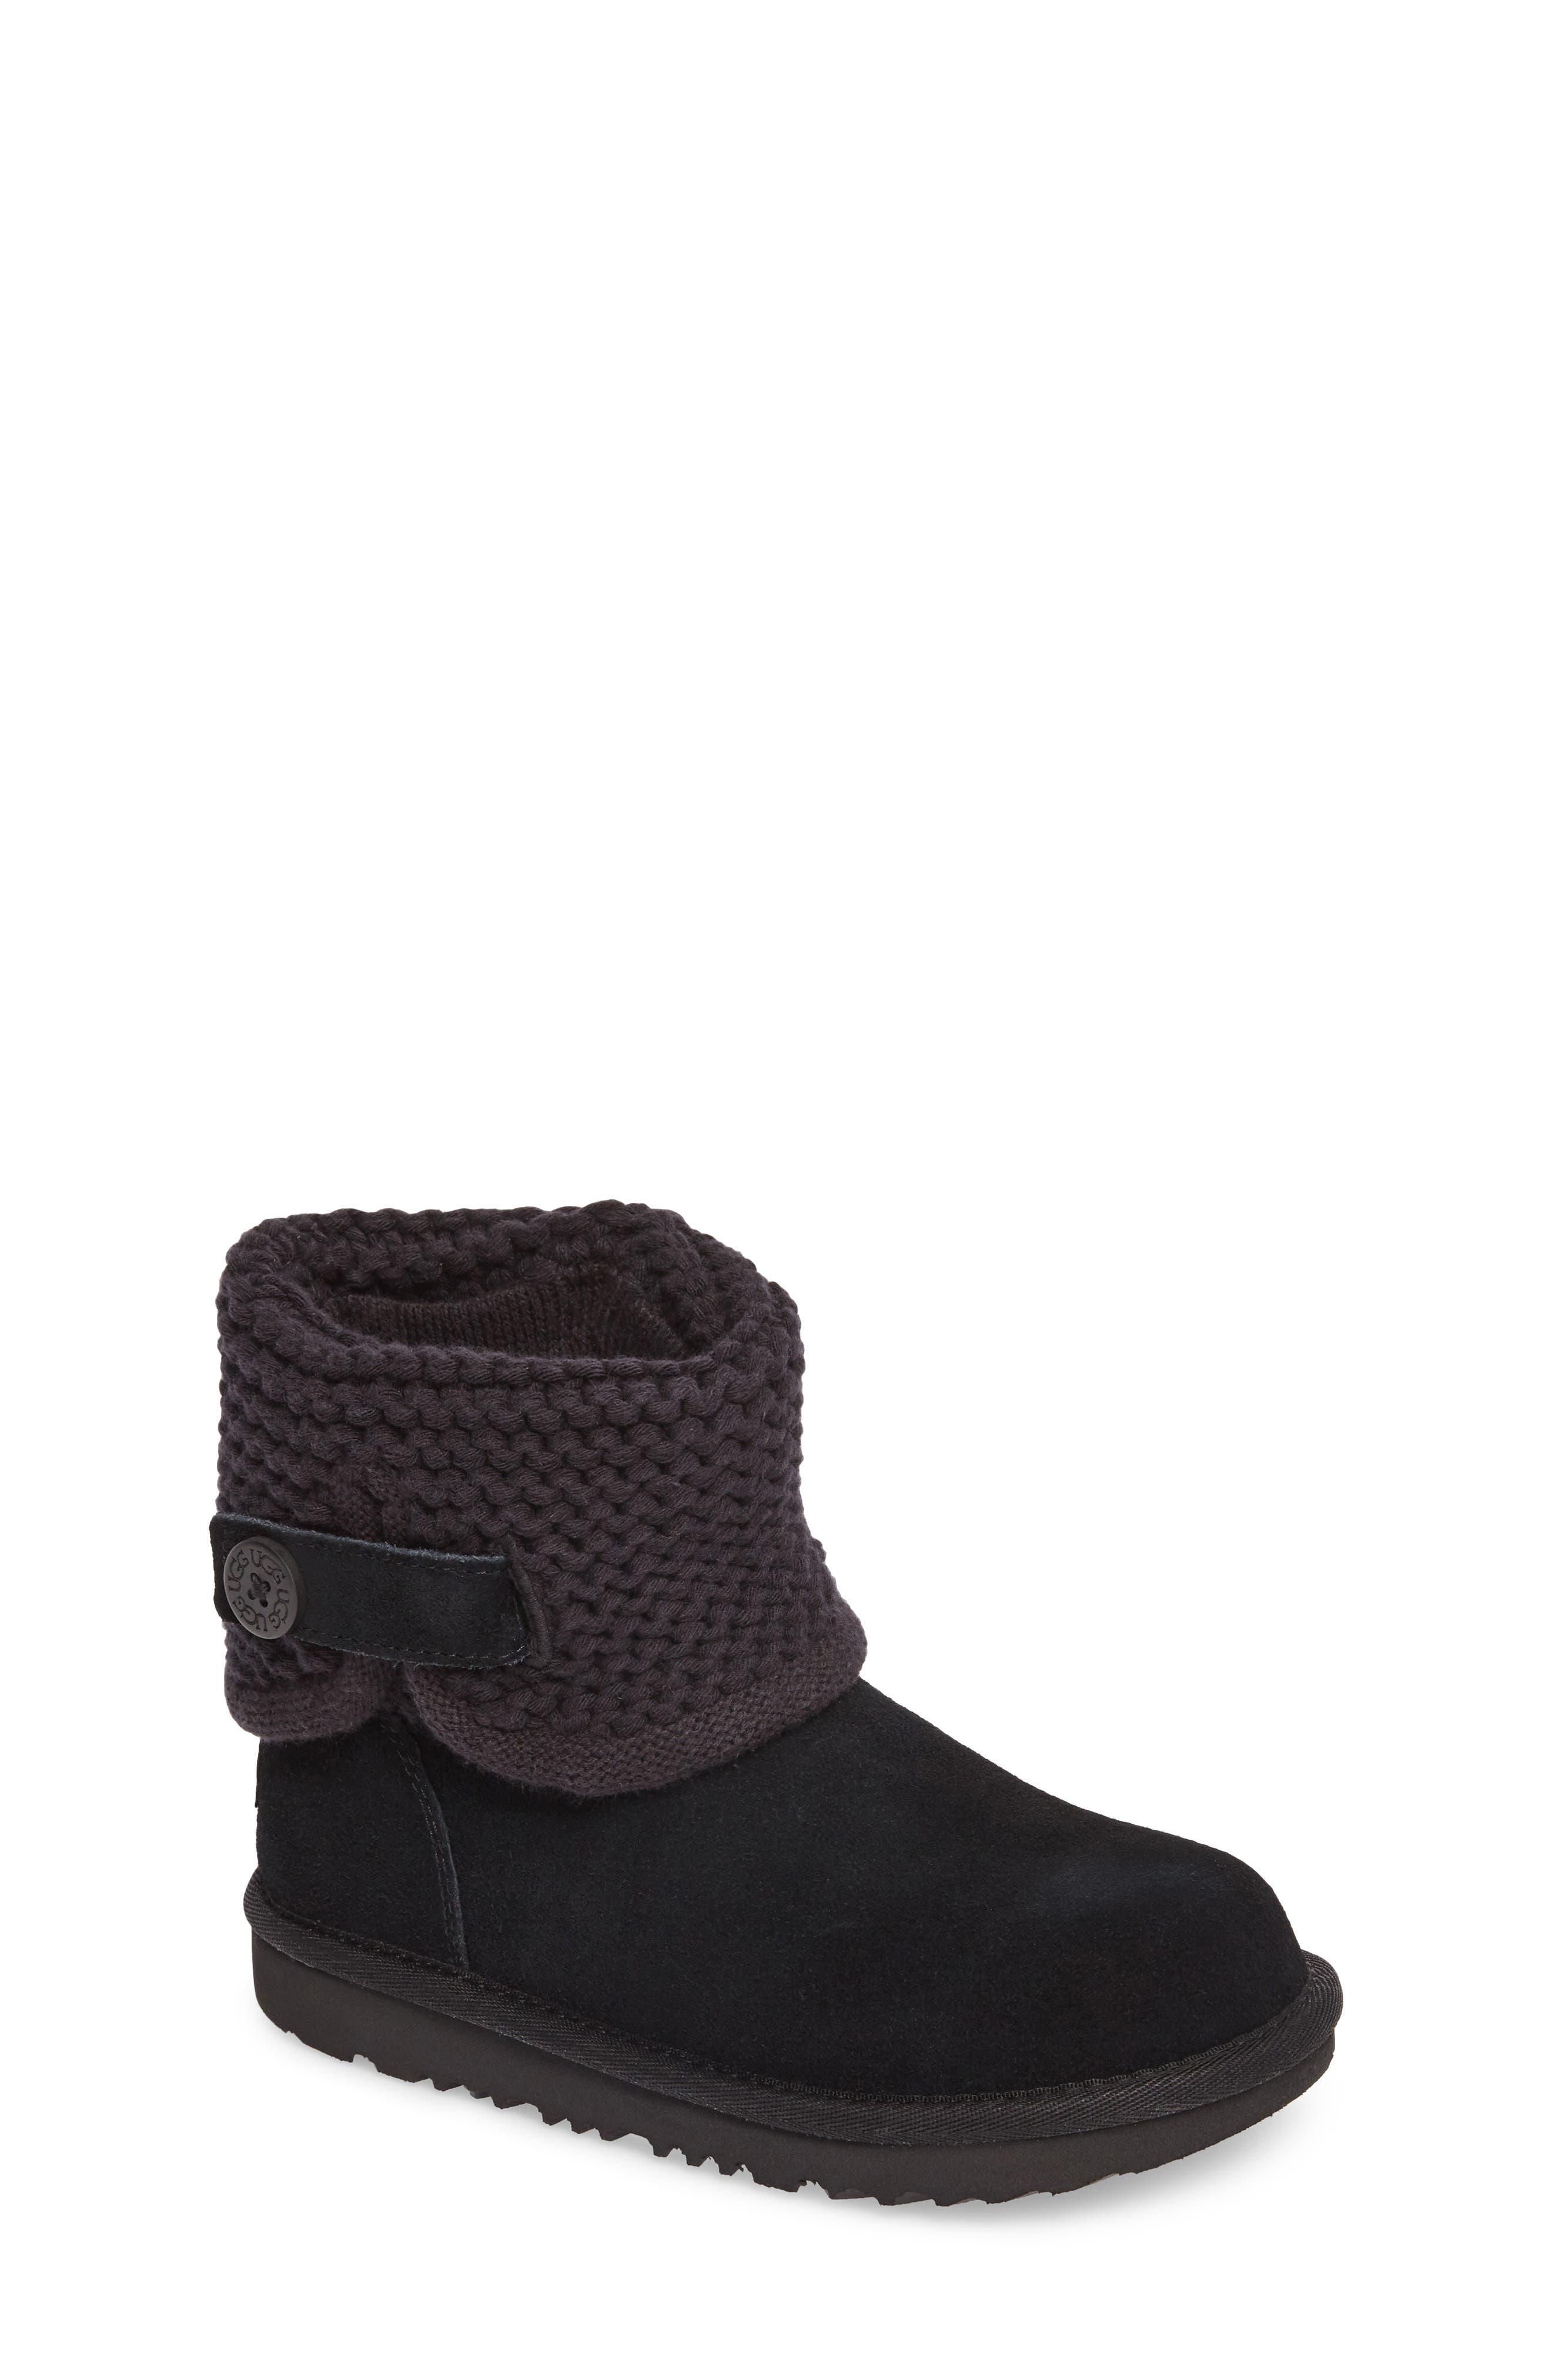 Darrah II Knit Cuff Boot,                         Main,                         color, 001